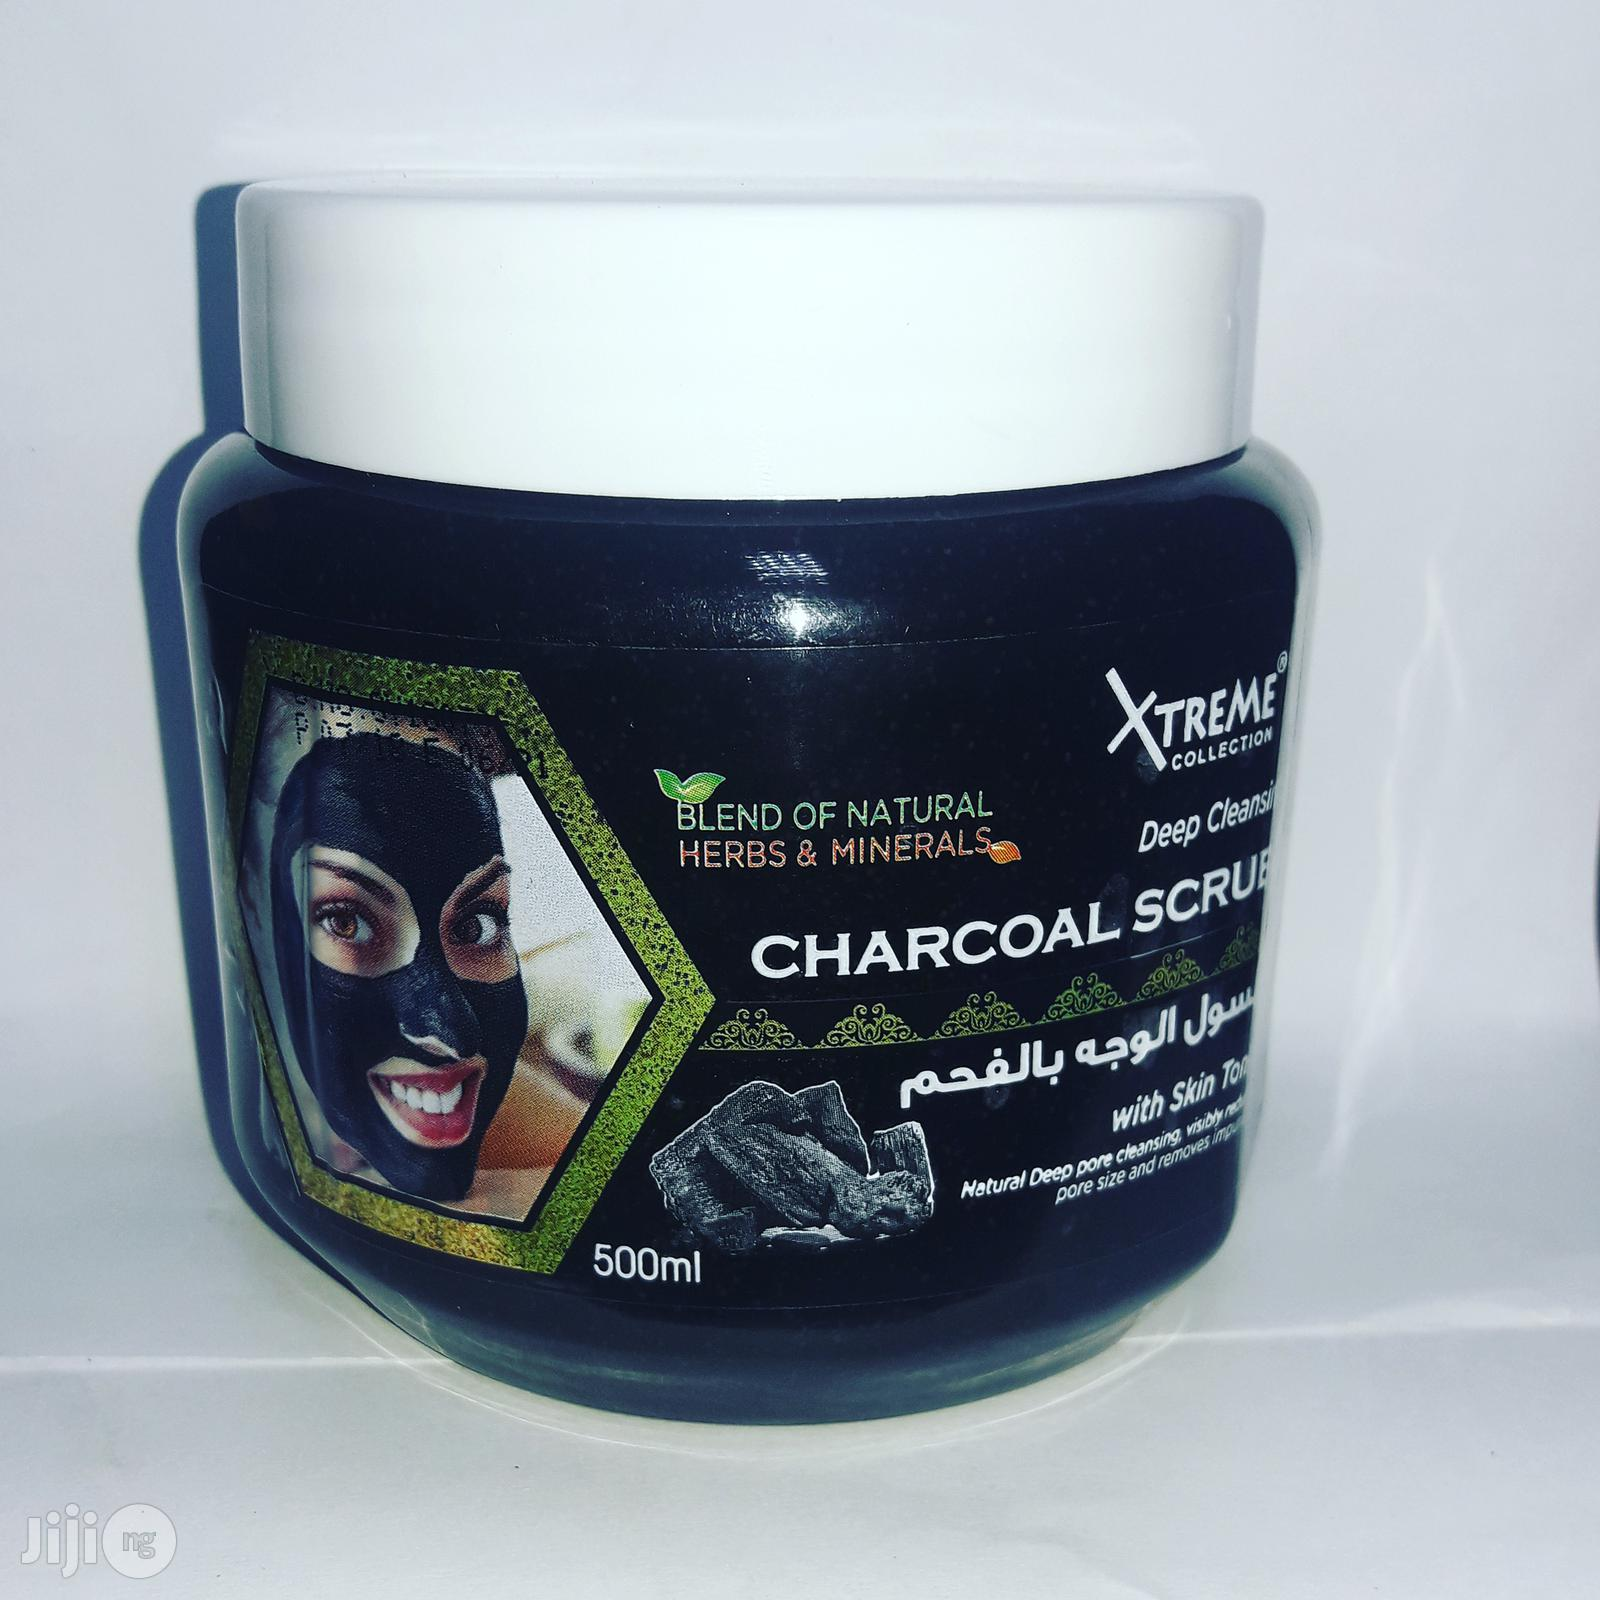 Xtreme Deep Cleansing Charcoal Scrub